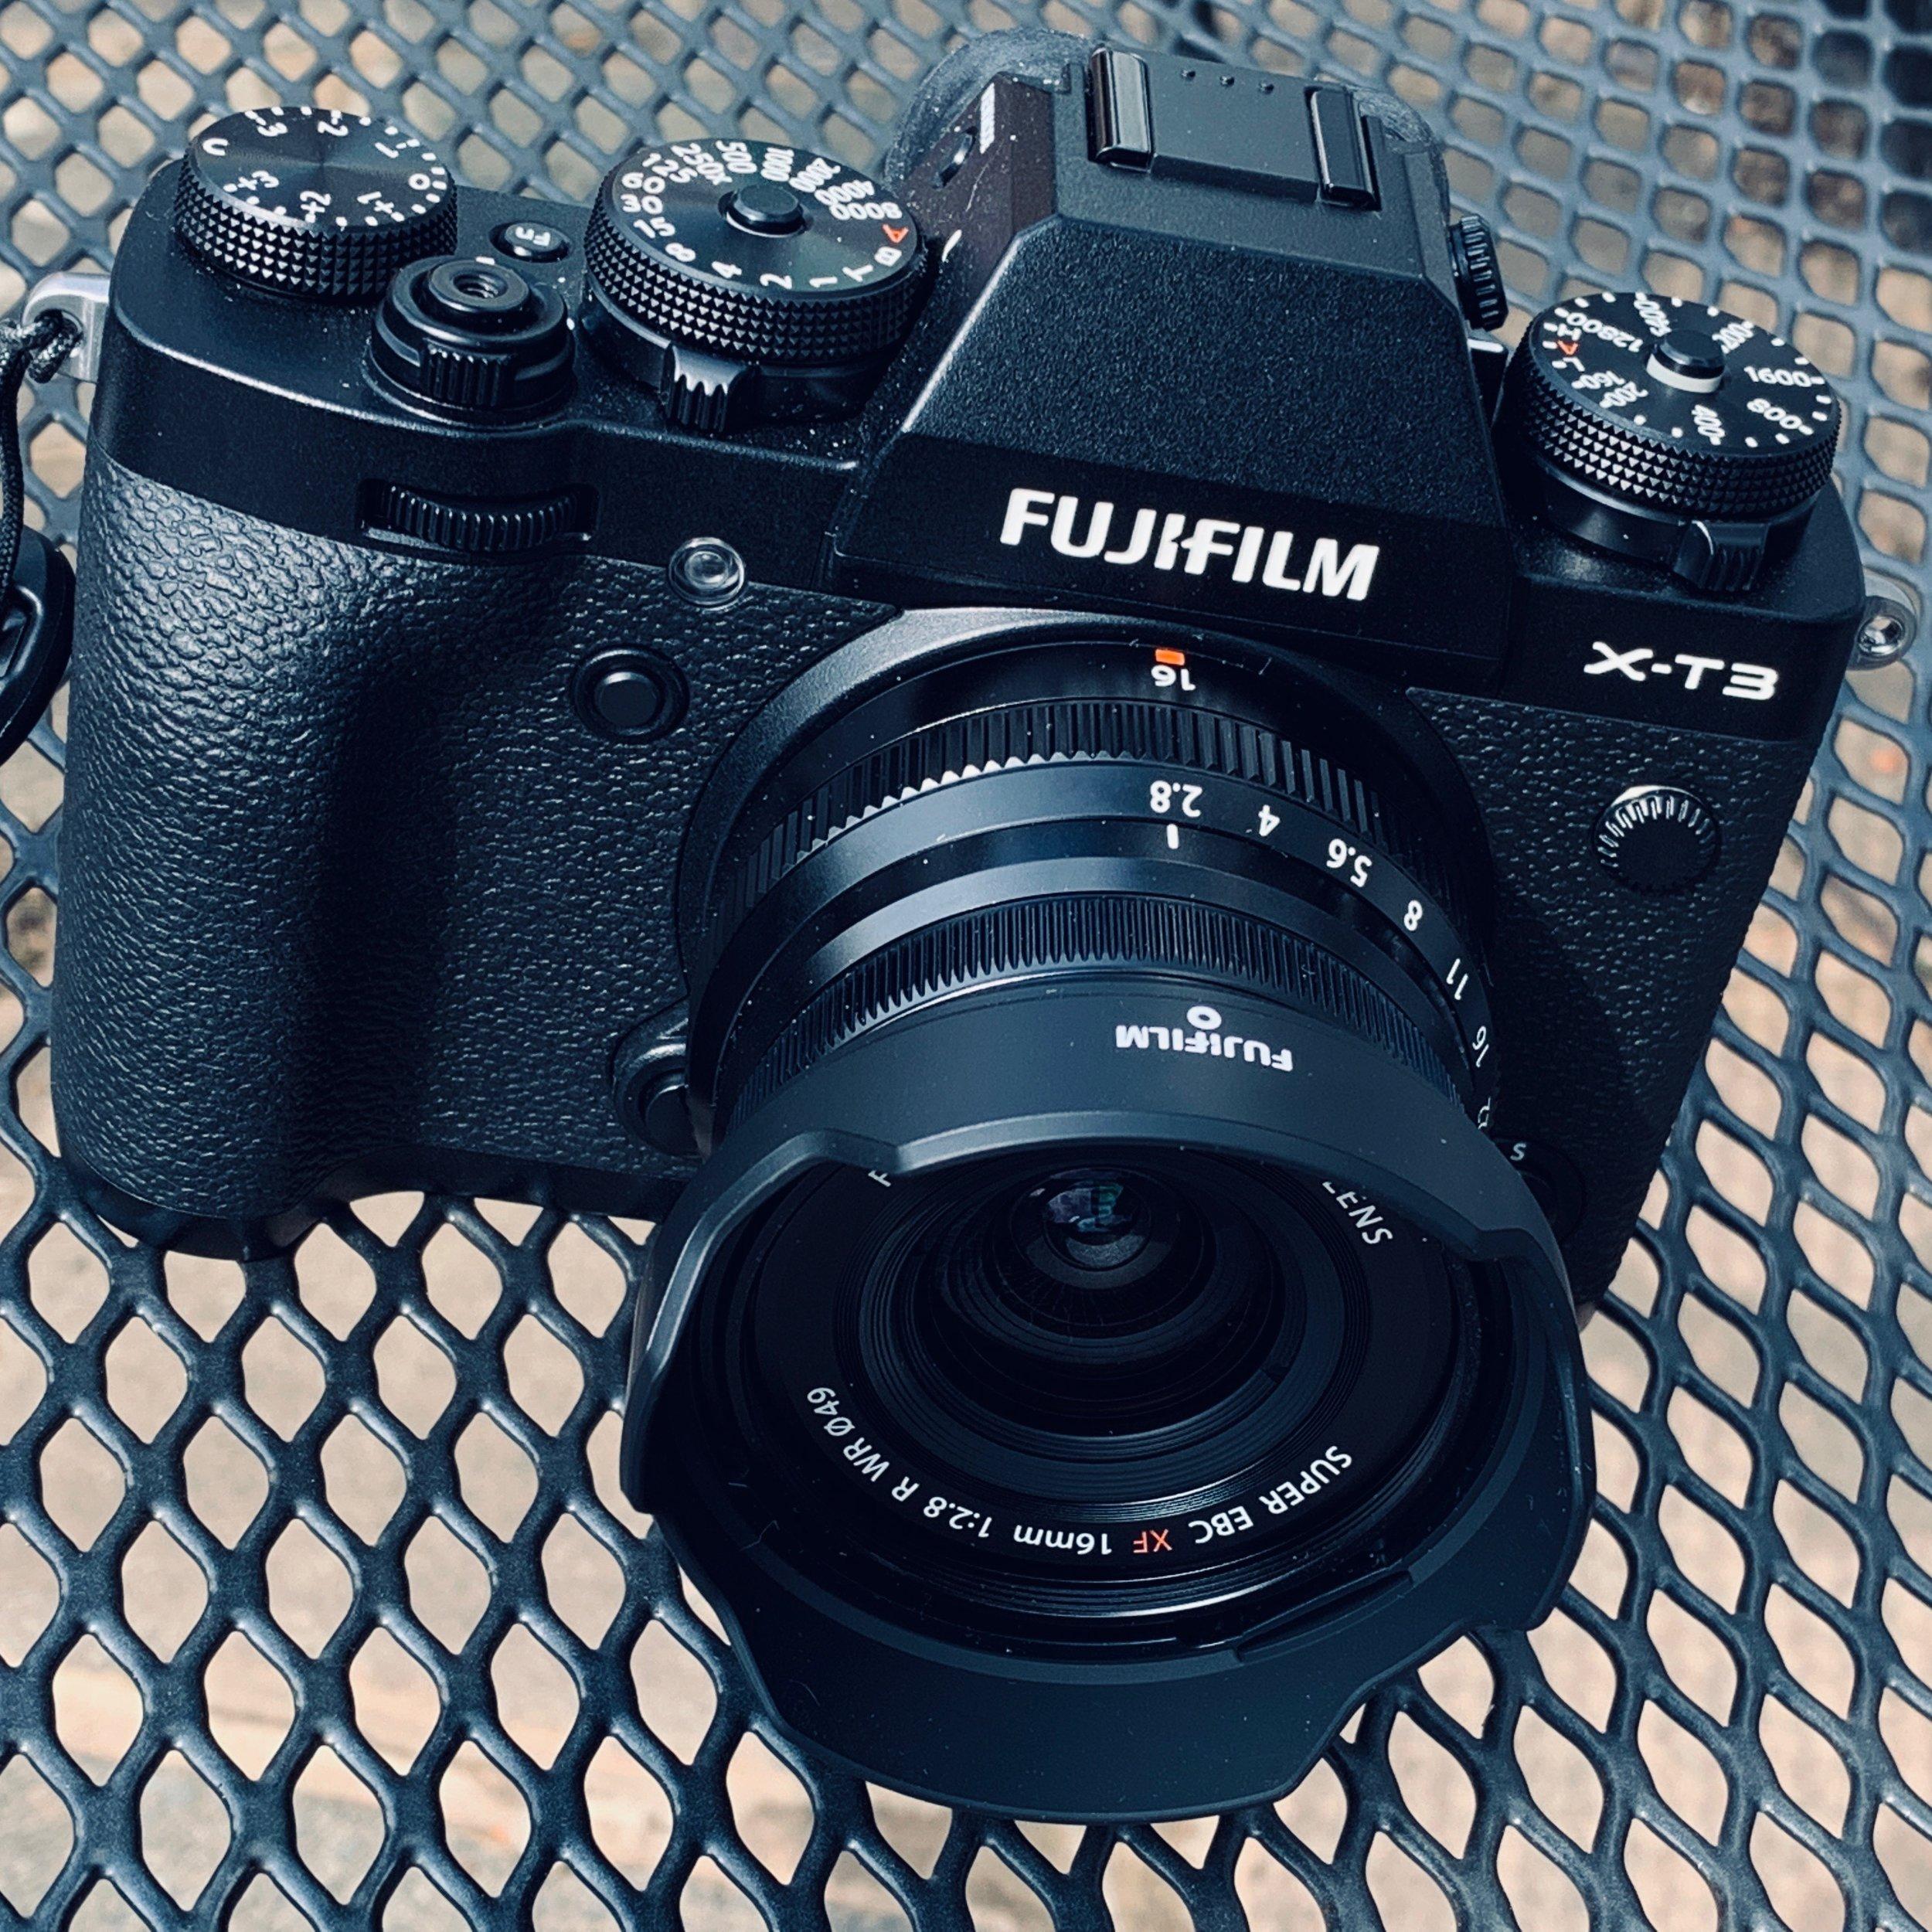 Fuji X-T2 and 16mm f2.8